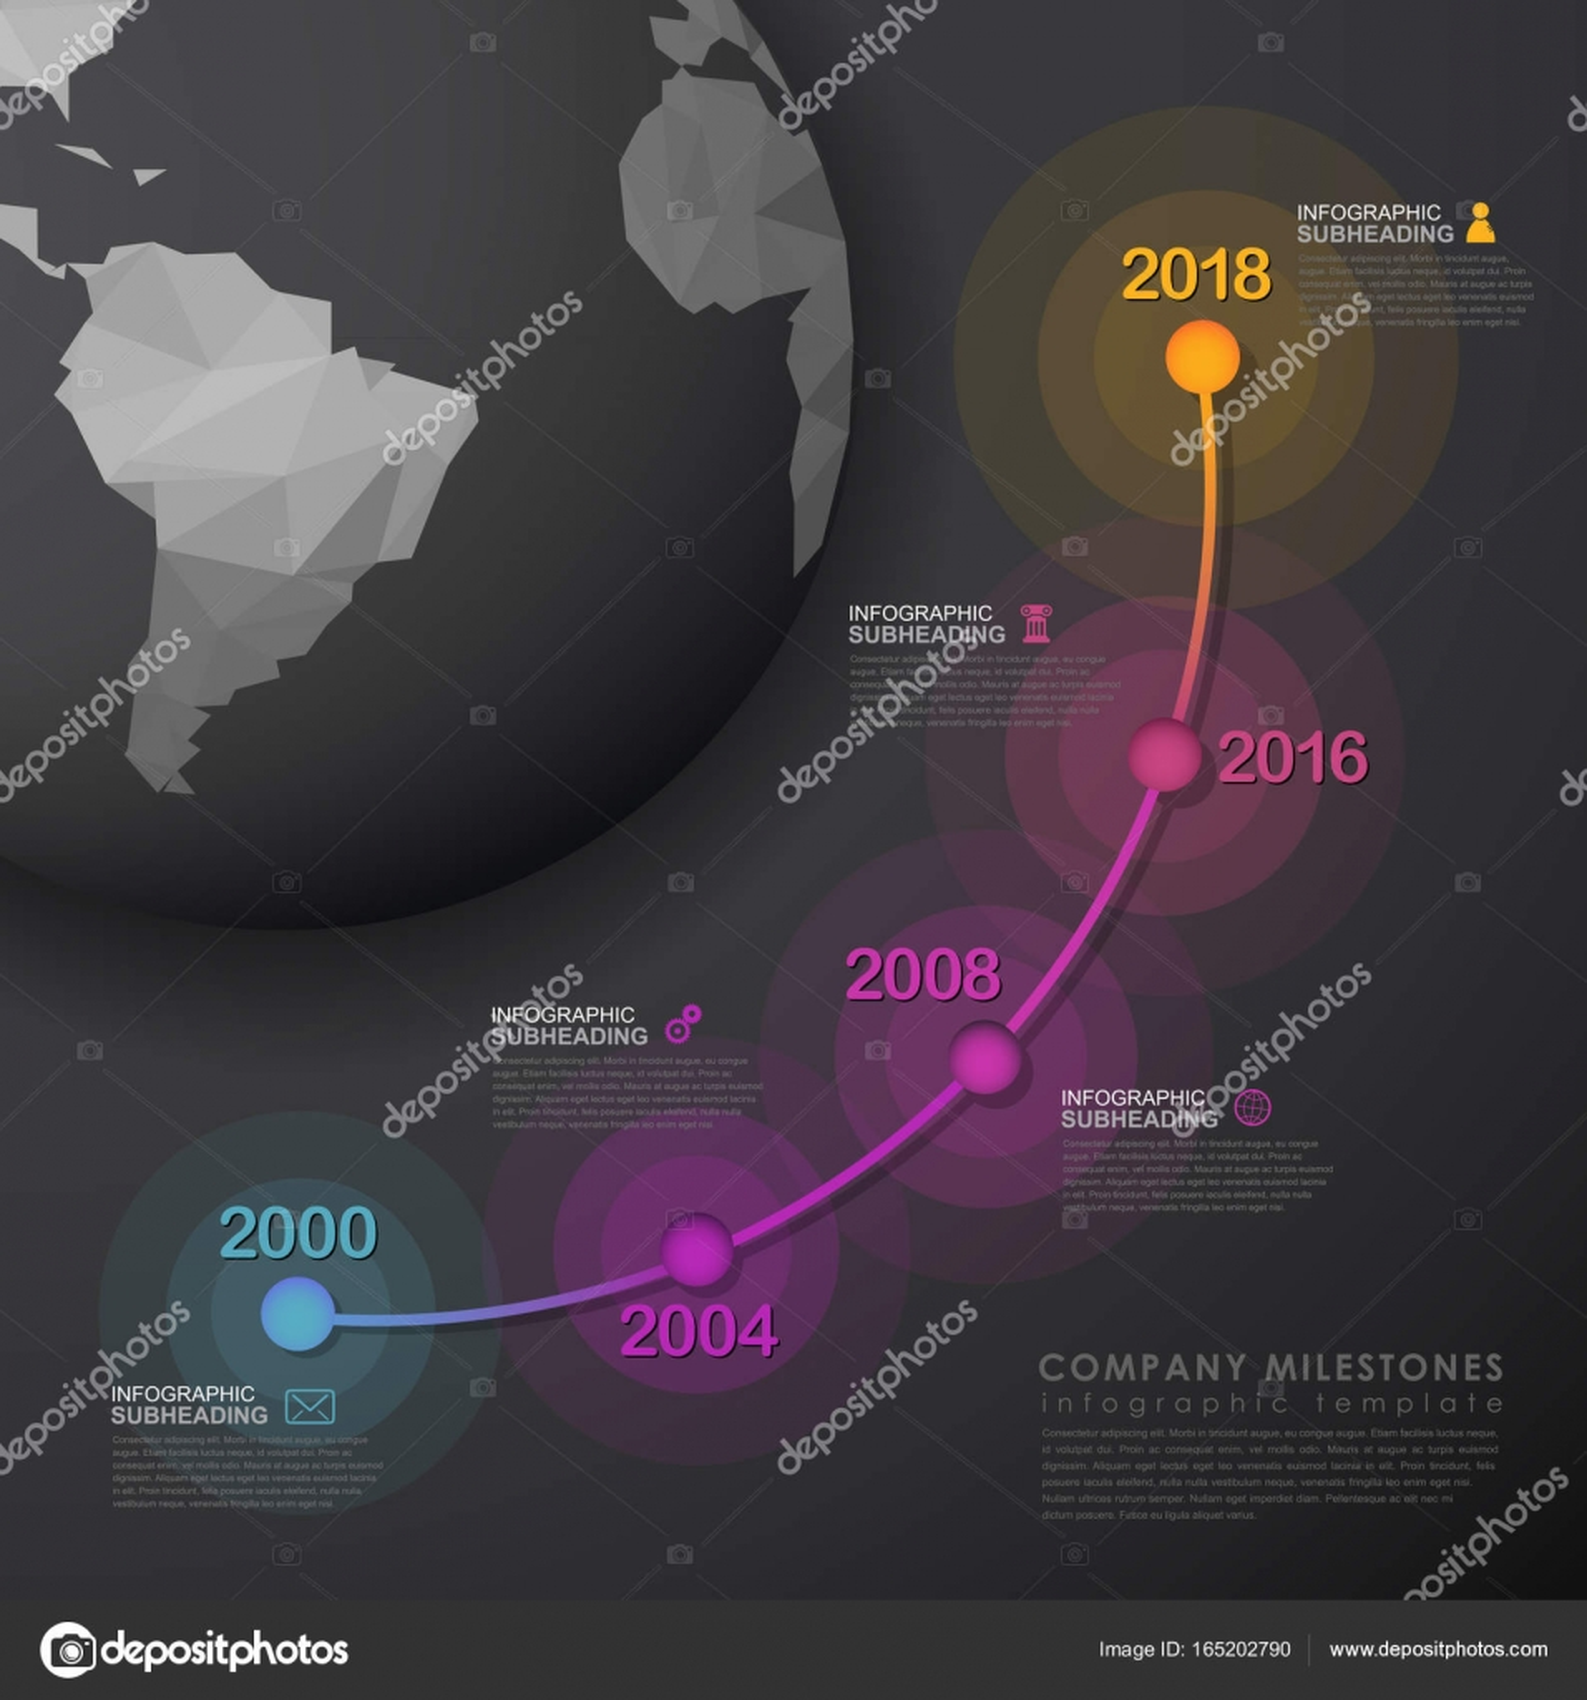 Infographic startup milestones timeline vector template with pol infographic startup milestones timeline vector template with pol stock vector maxwellsz